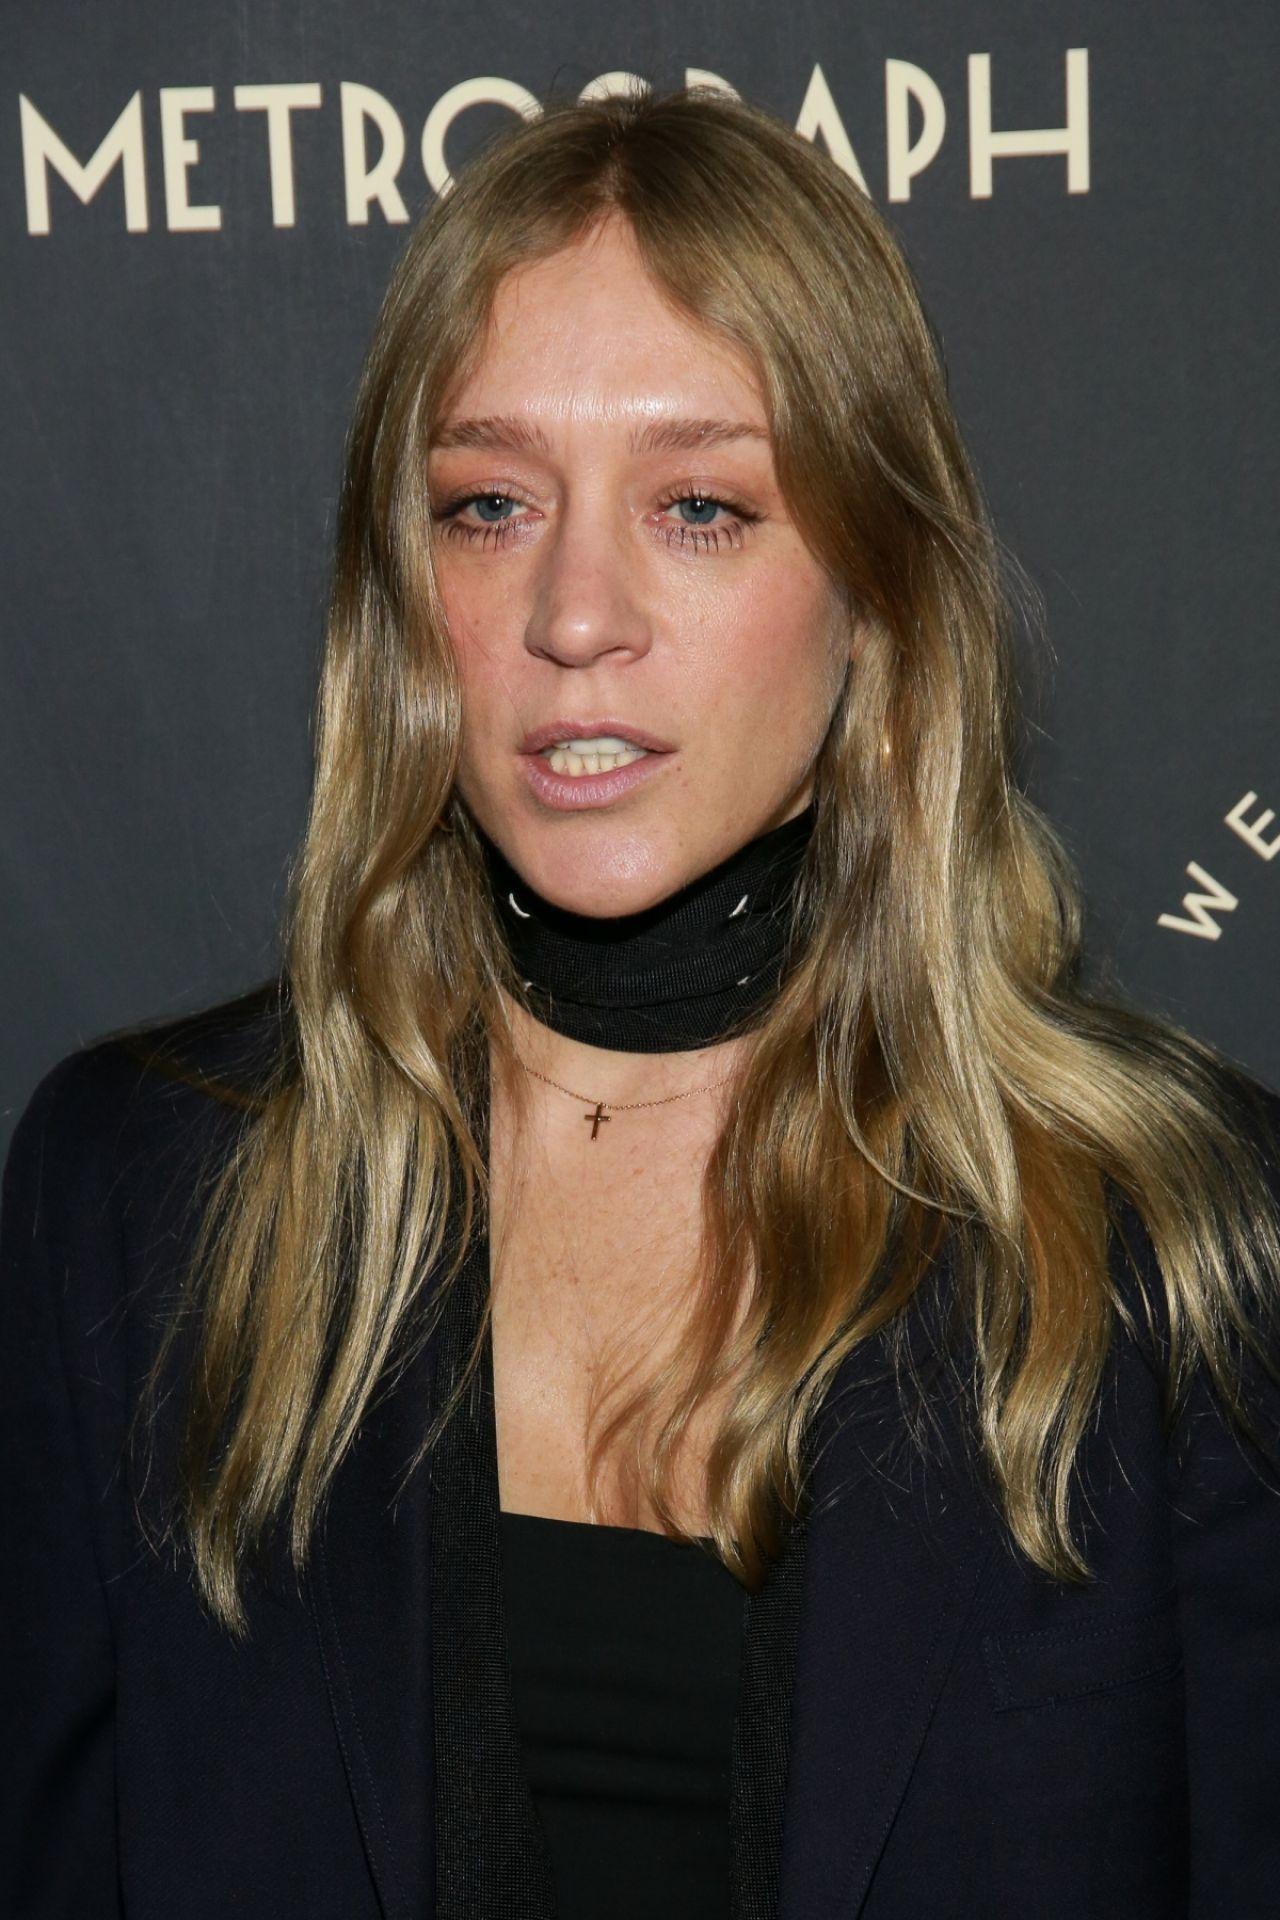 Chloe Sevigny Metrograph Party In New York 03 22 2018